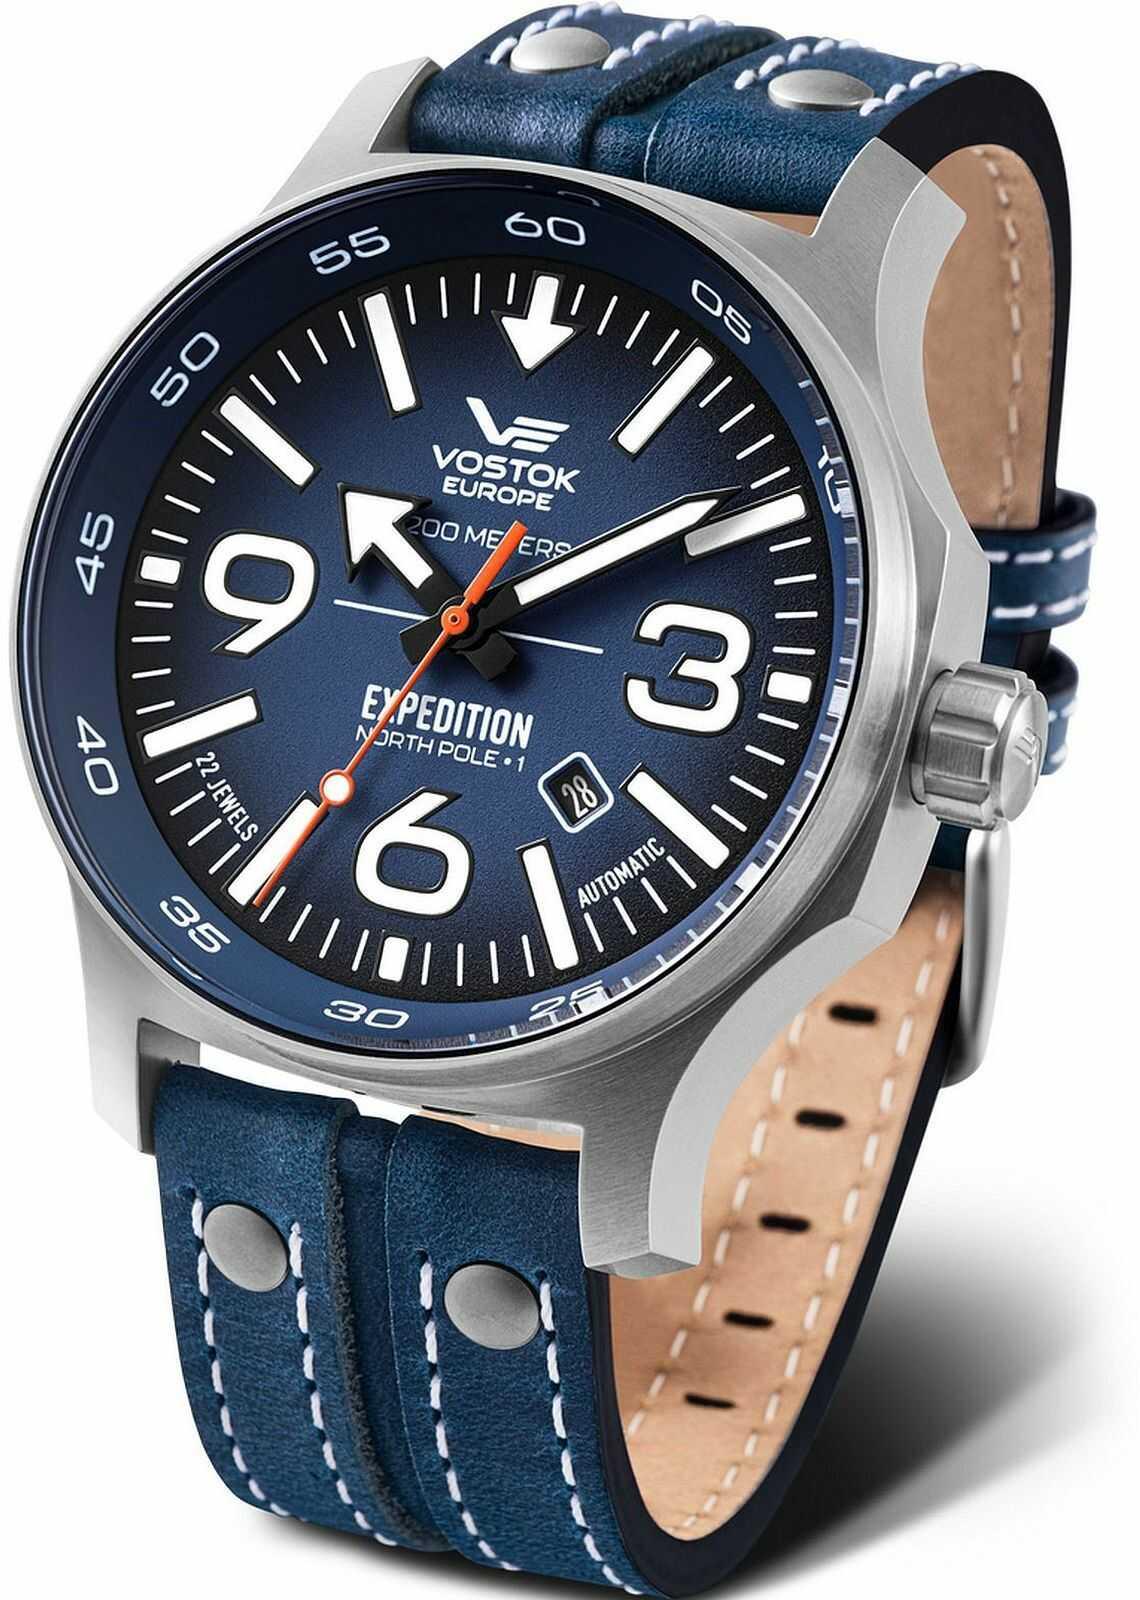 Zegarek męski Vostok Europe Expedition North Pole-1 Limited Edition